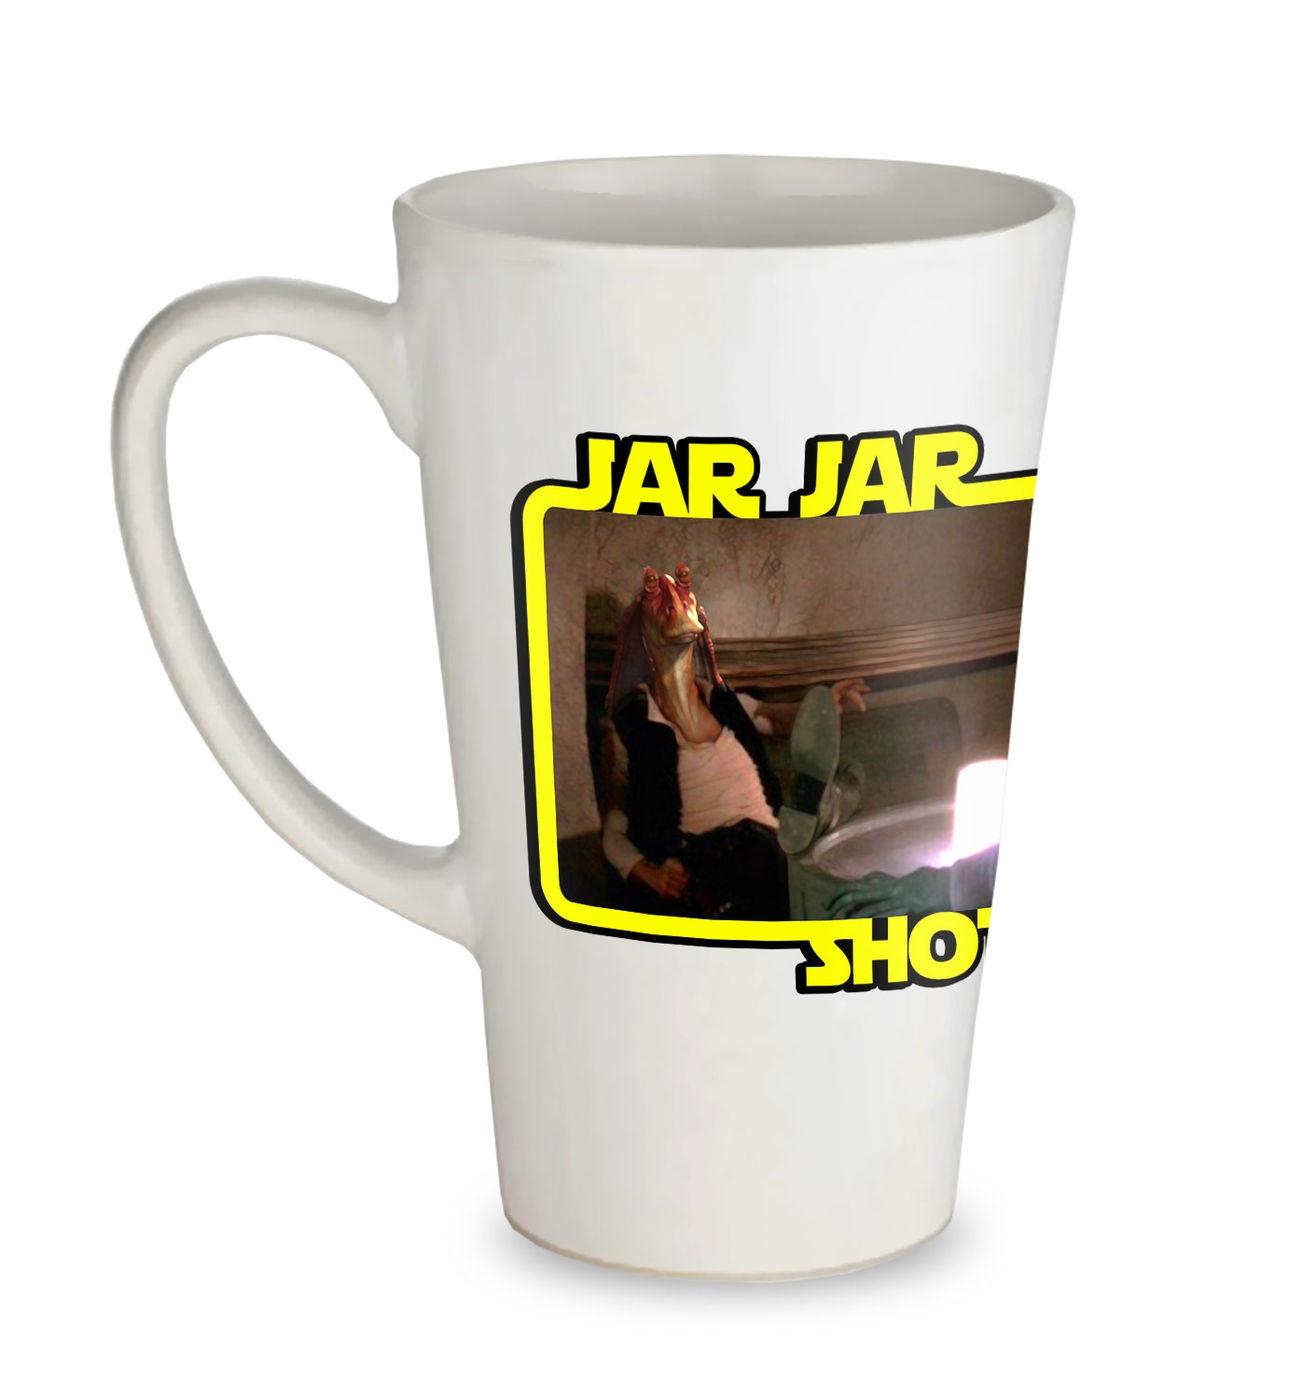 Jar Jar Shot First tall latte mug